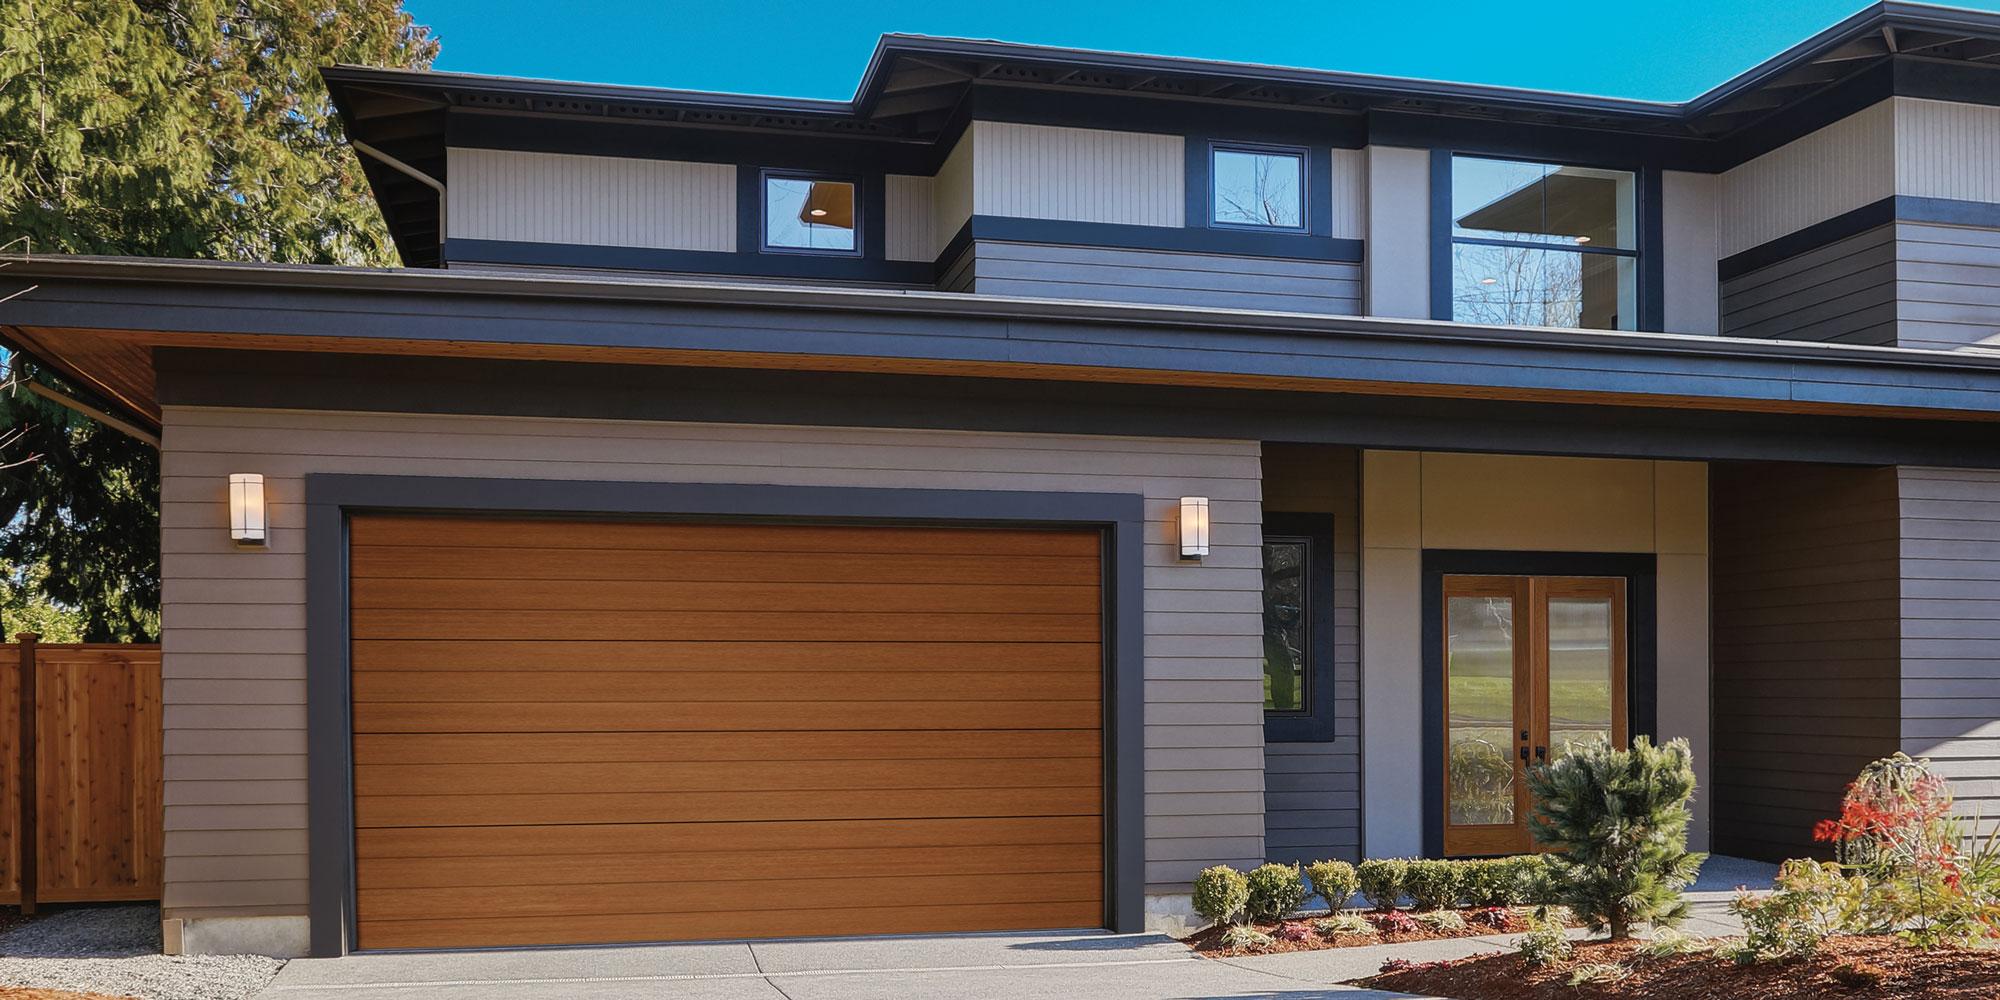 Translucent Garage Door